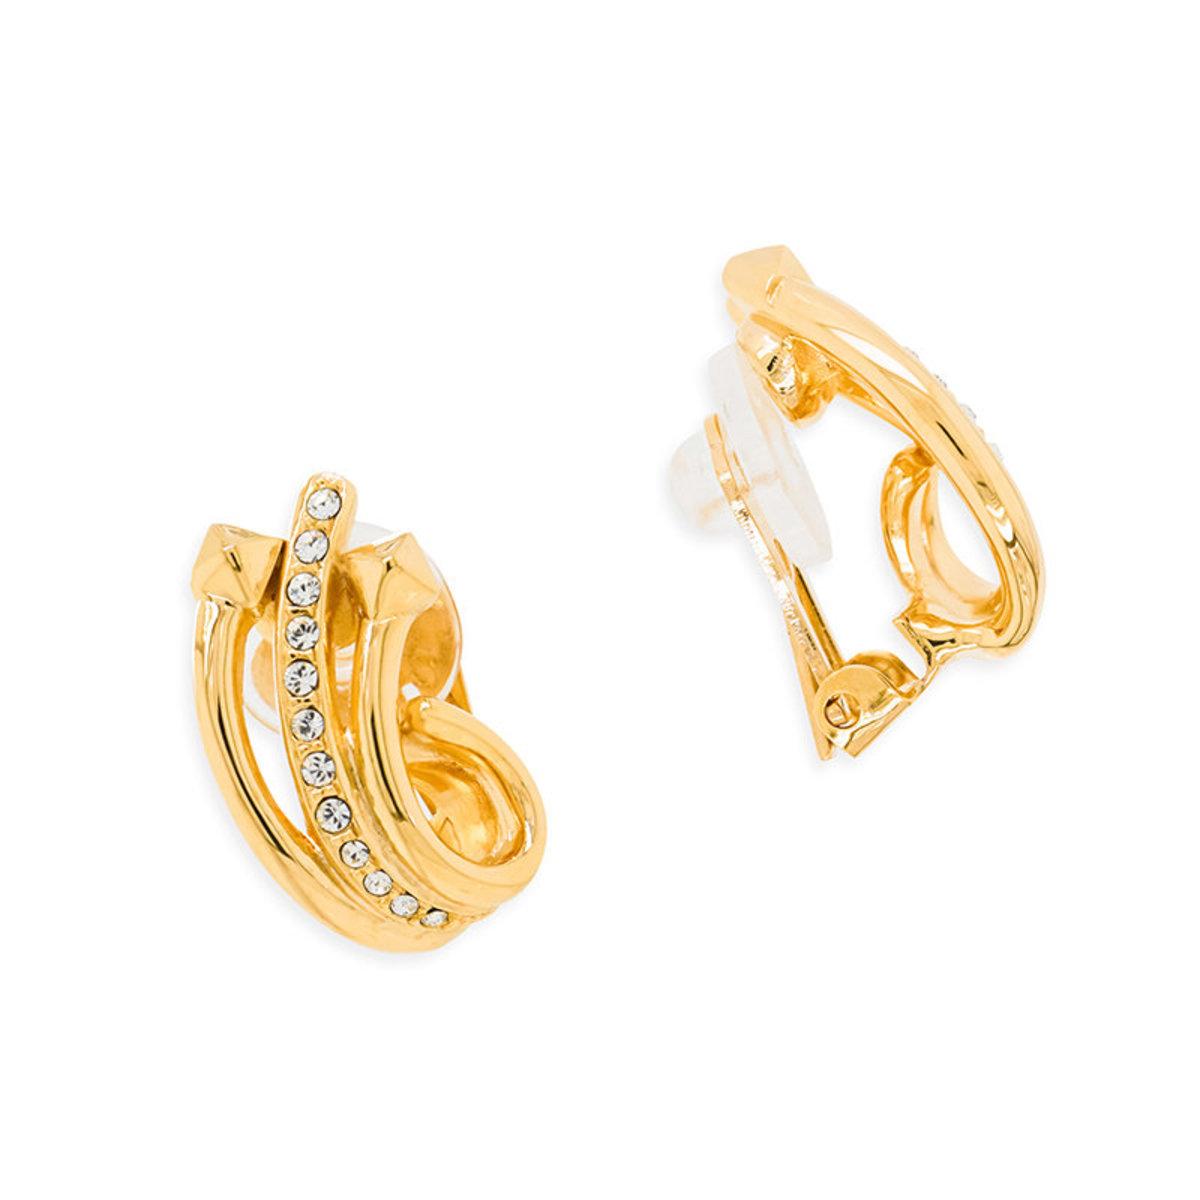 Tasseltastic: gold plating, Swarovski crystal clip earrings